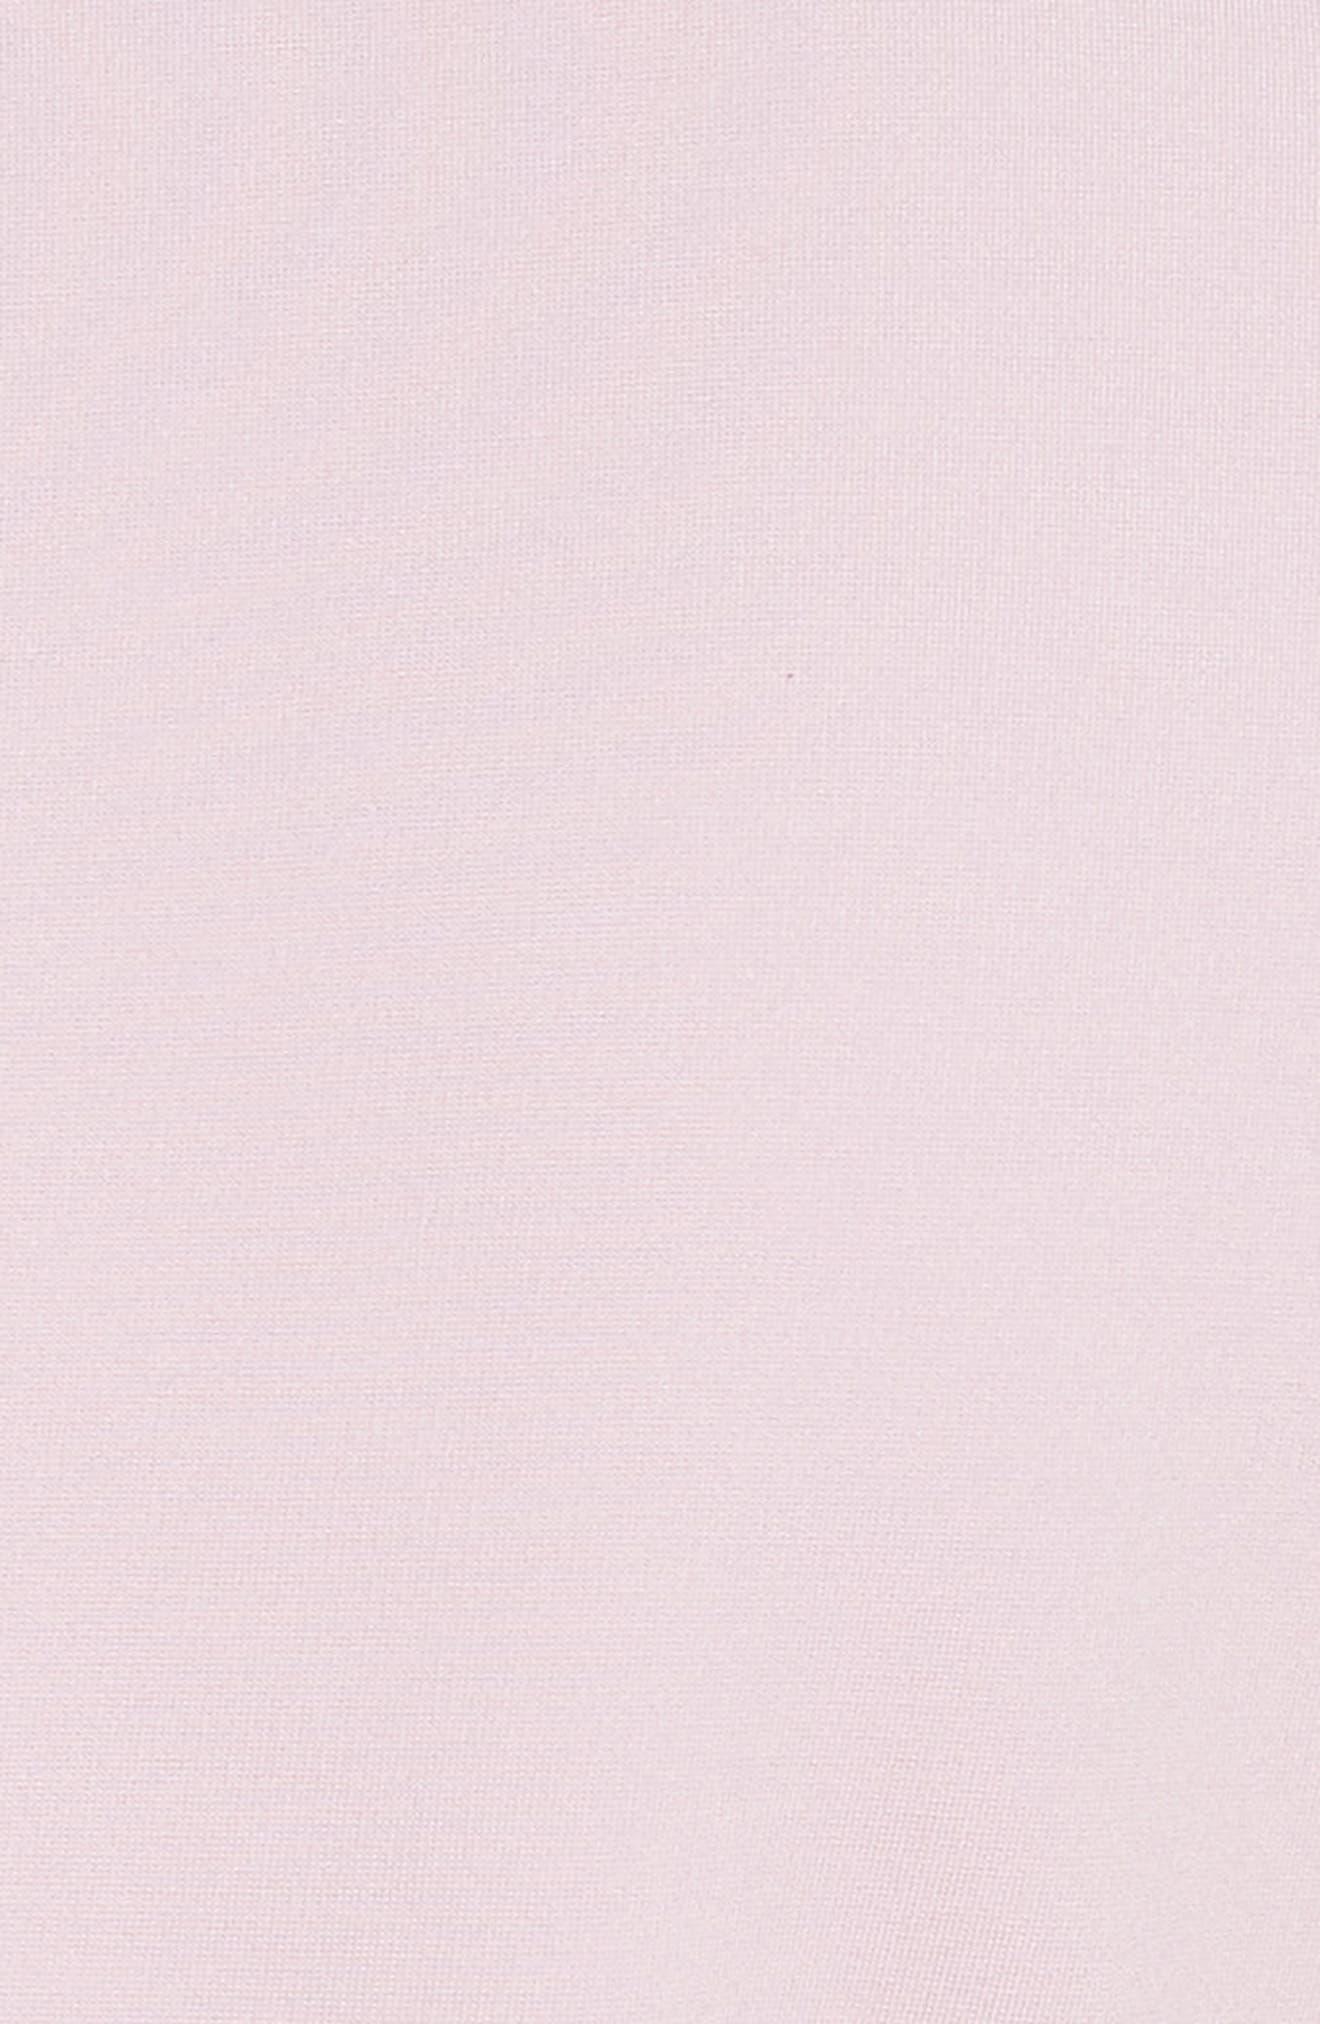 TED BAKER LONDON,                             Satin Pleat Detail Shift Dress,                             Alternate thumbnail 5, color,                             680